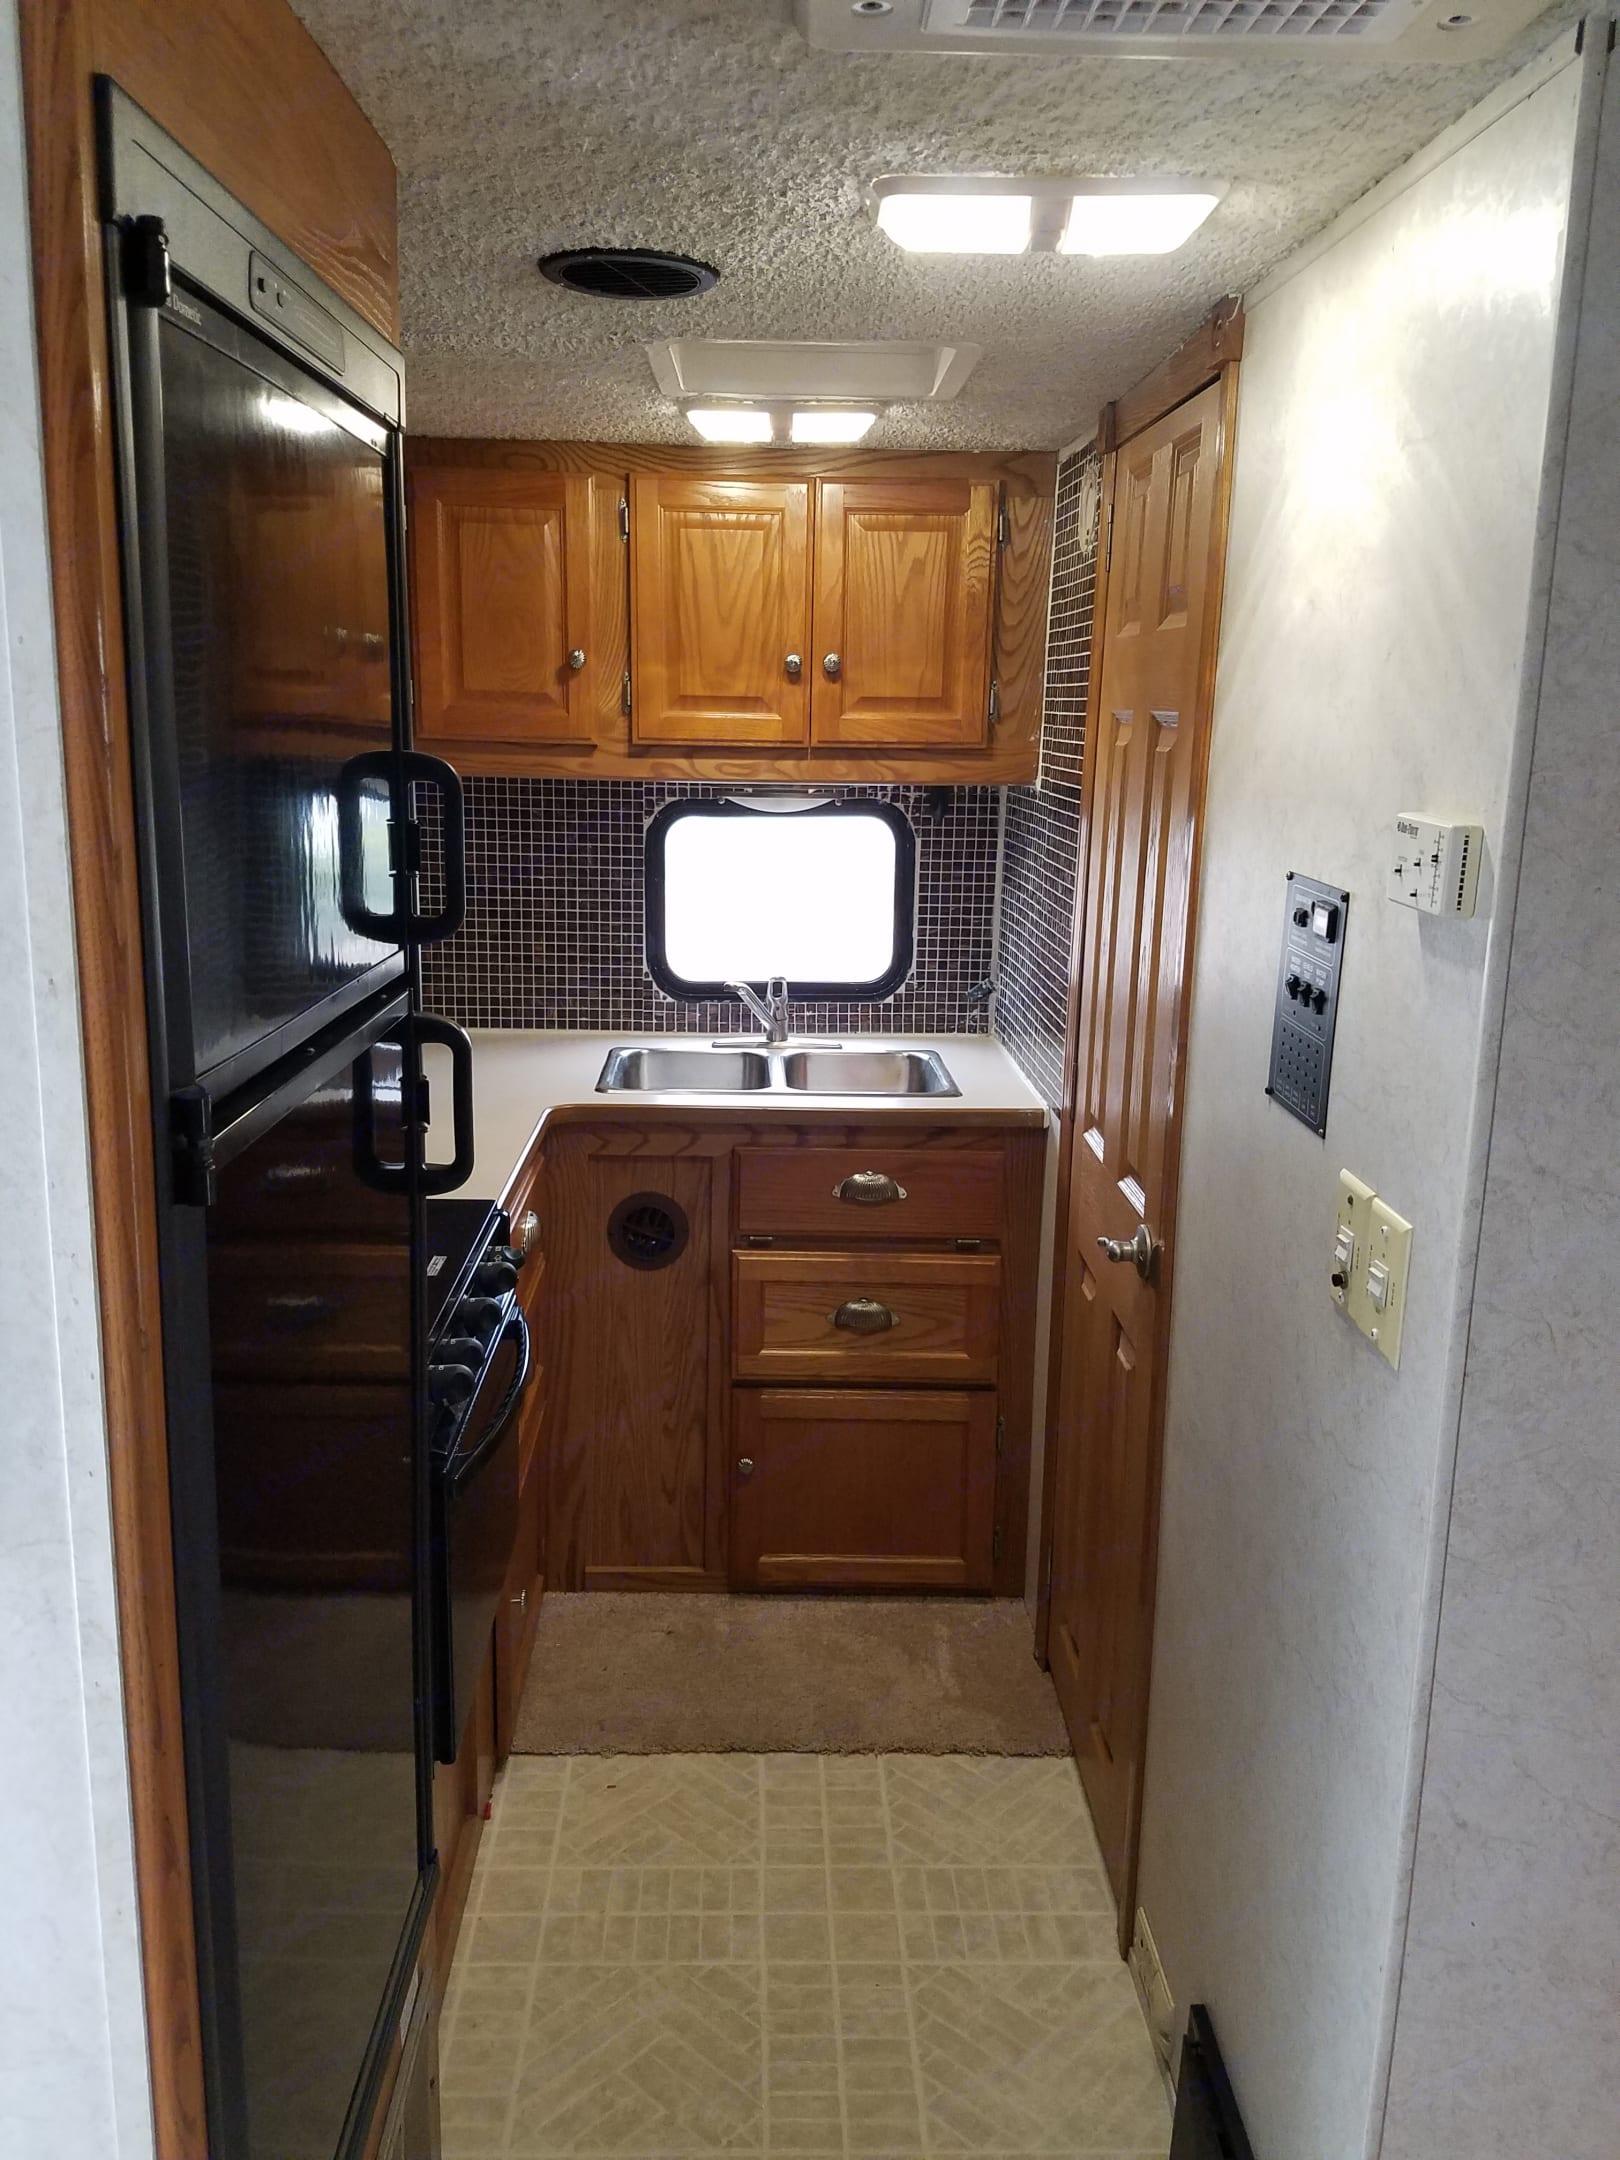 Kitchen. Gulf Stream B Touring Cruiser 2004